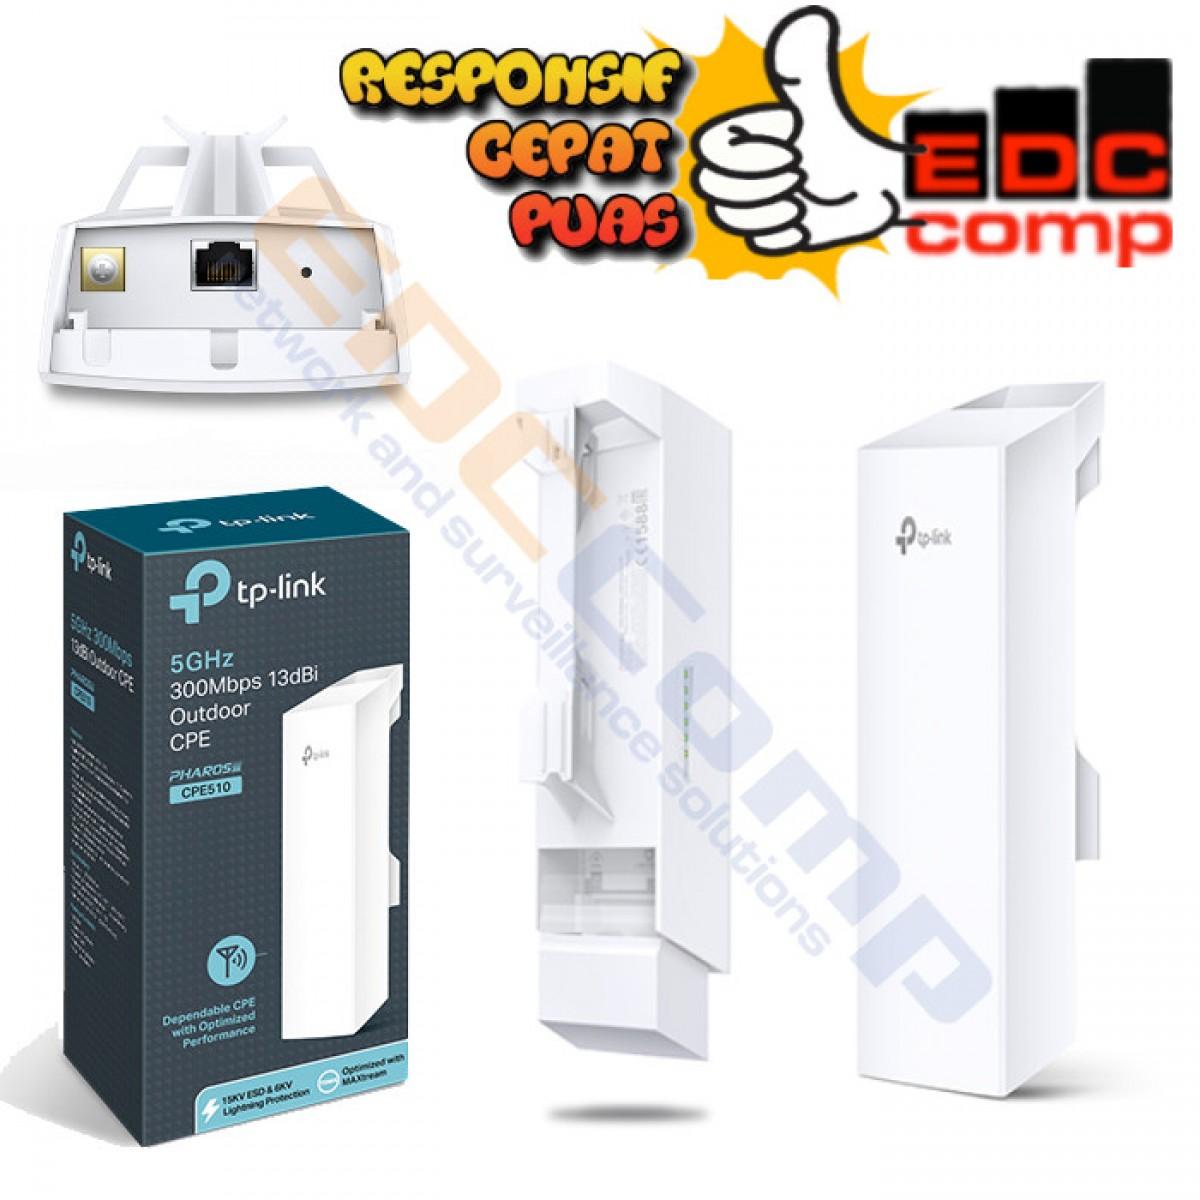 5GHz 300Mbps 13dBi Outdoor CPE CPE510 TP-Link TPlink - EdcComp